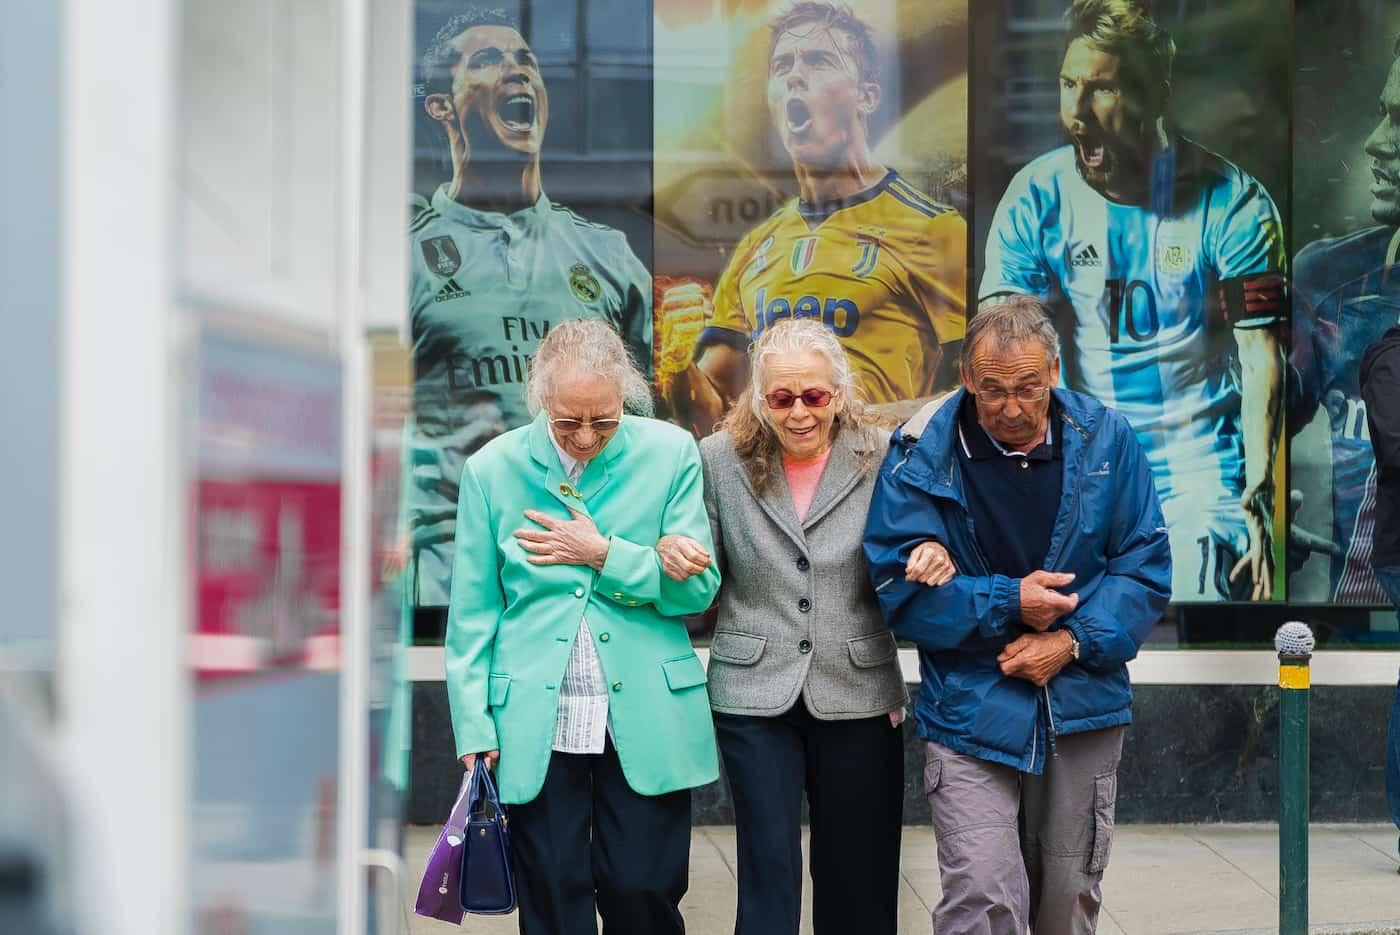 Happy seniors enjoying a post-covid world